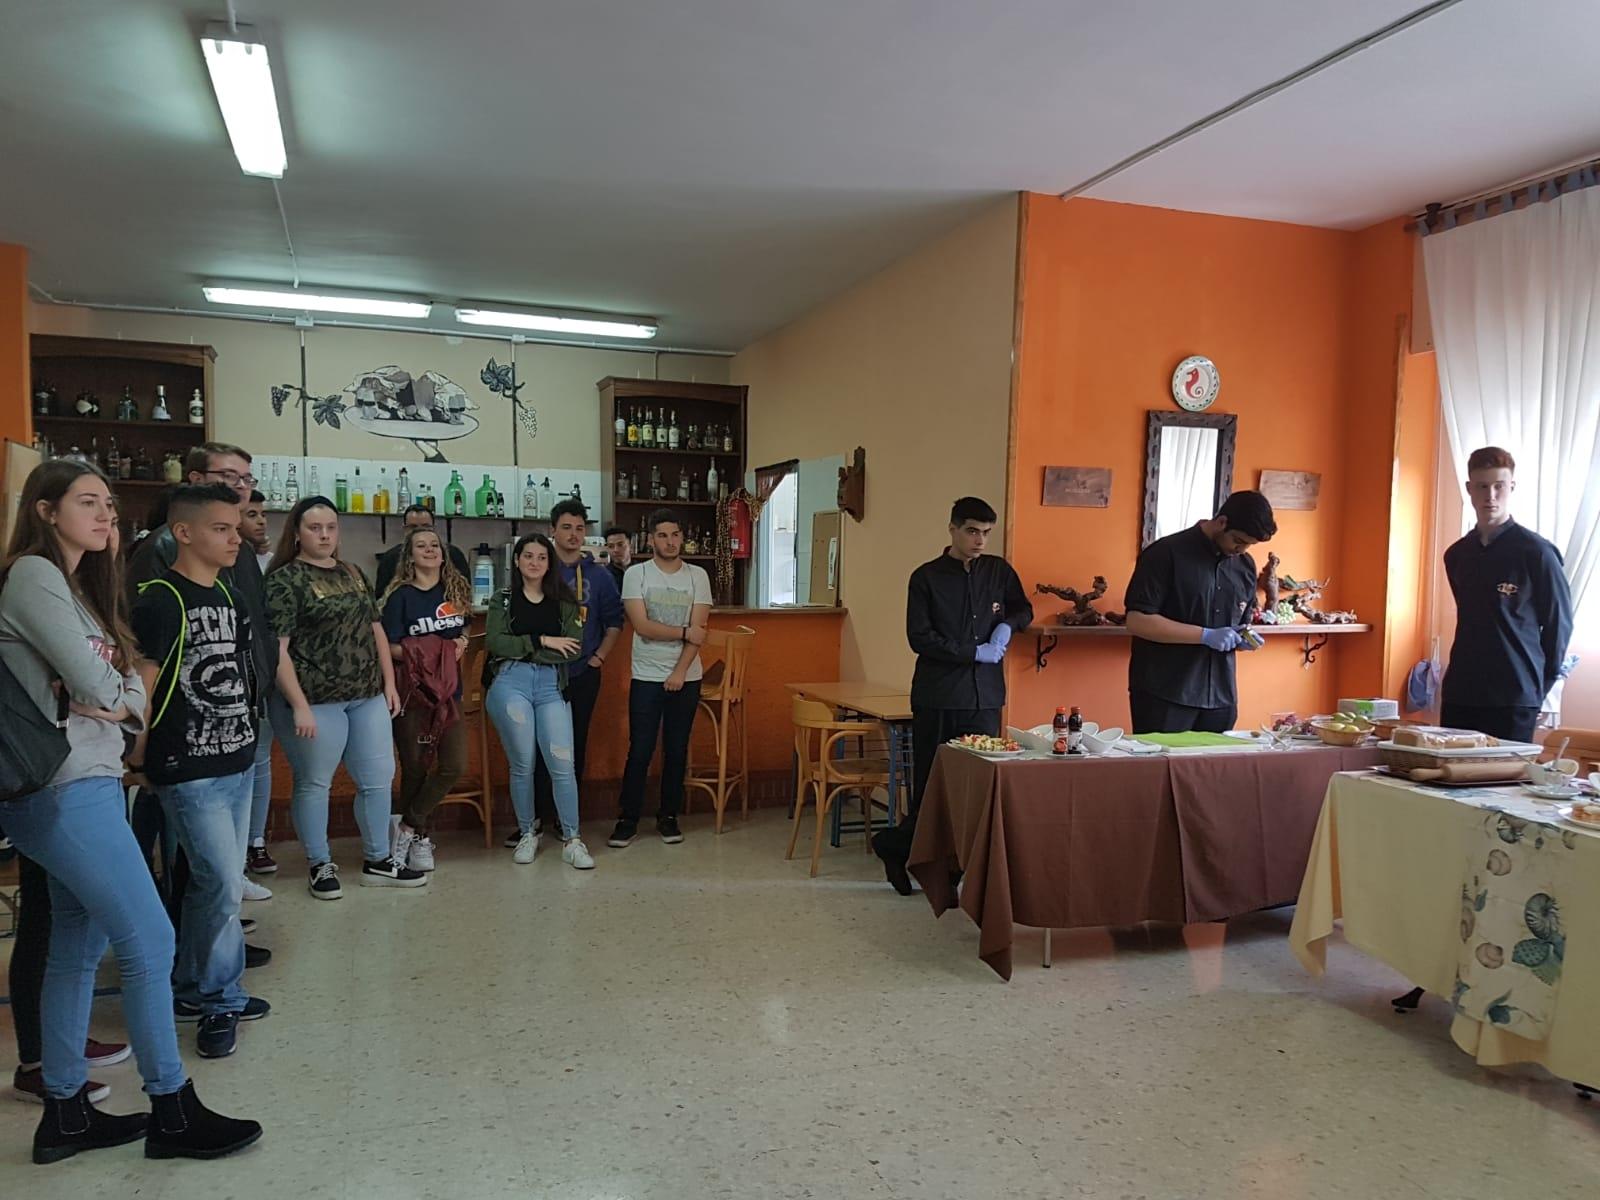 visita-CF-Motril-Salobreña-2019-14